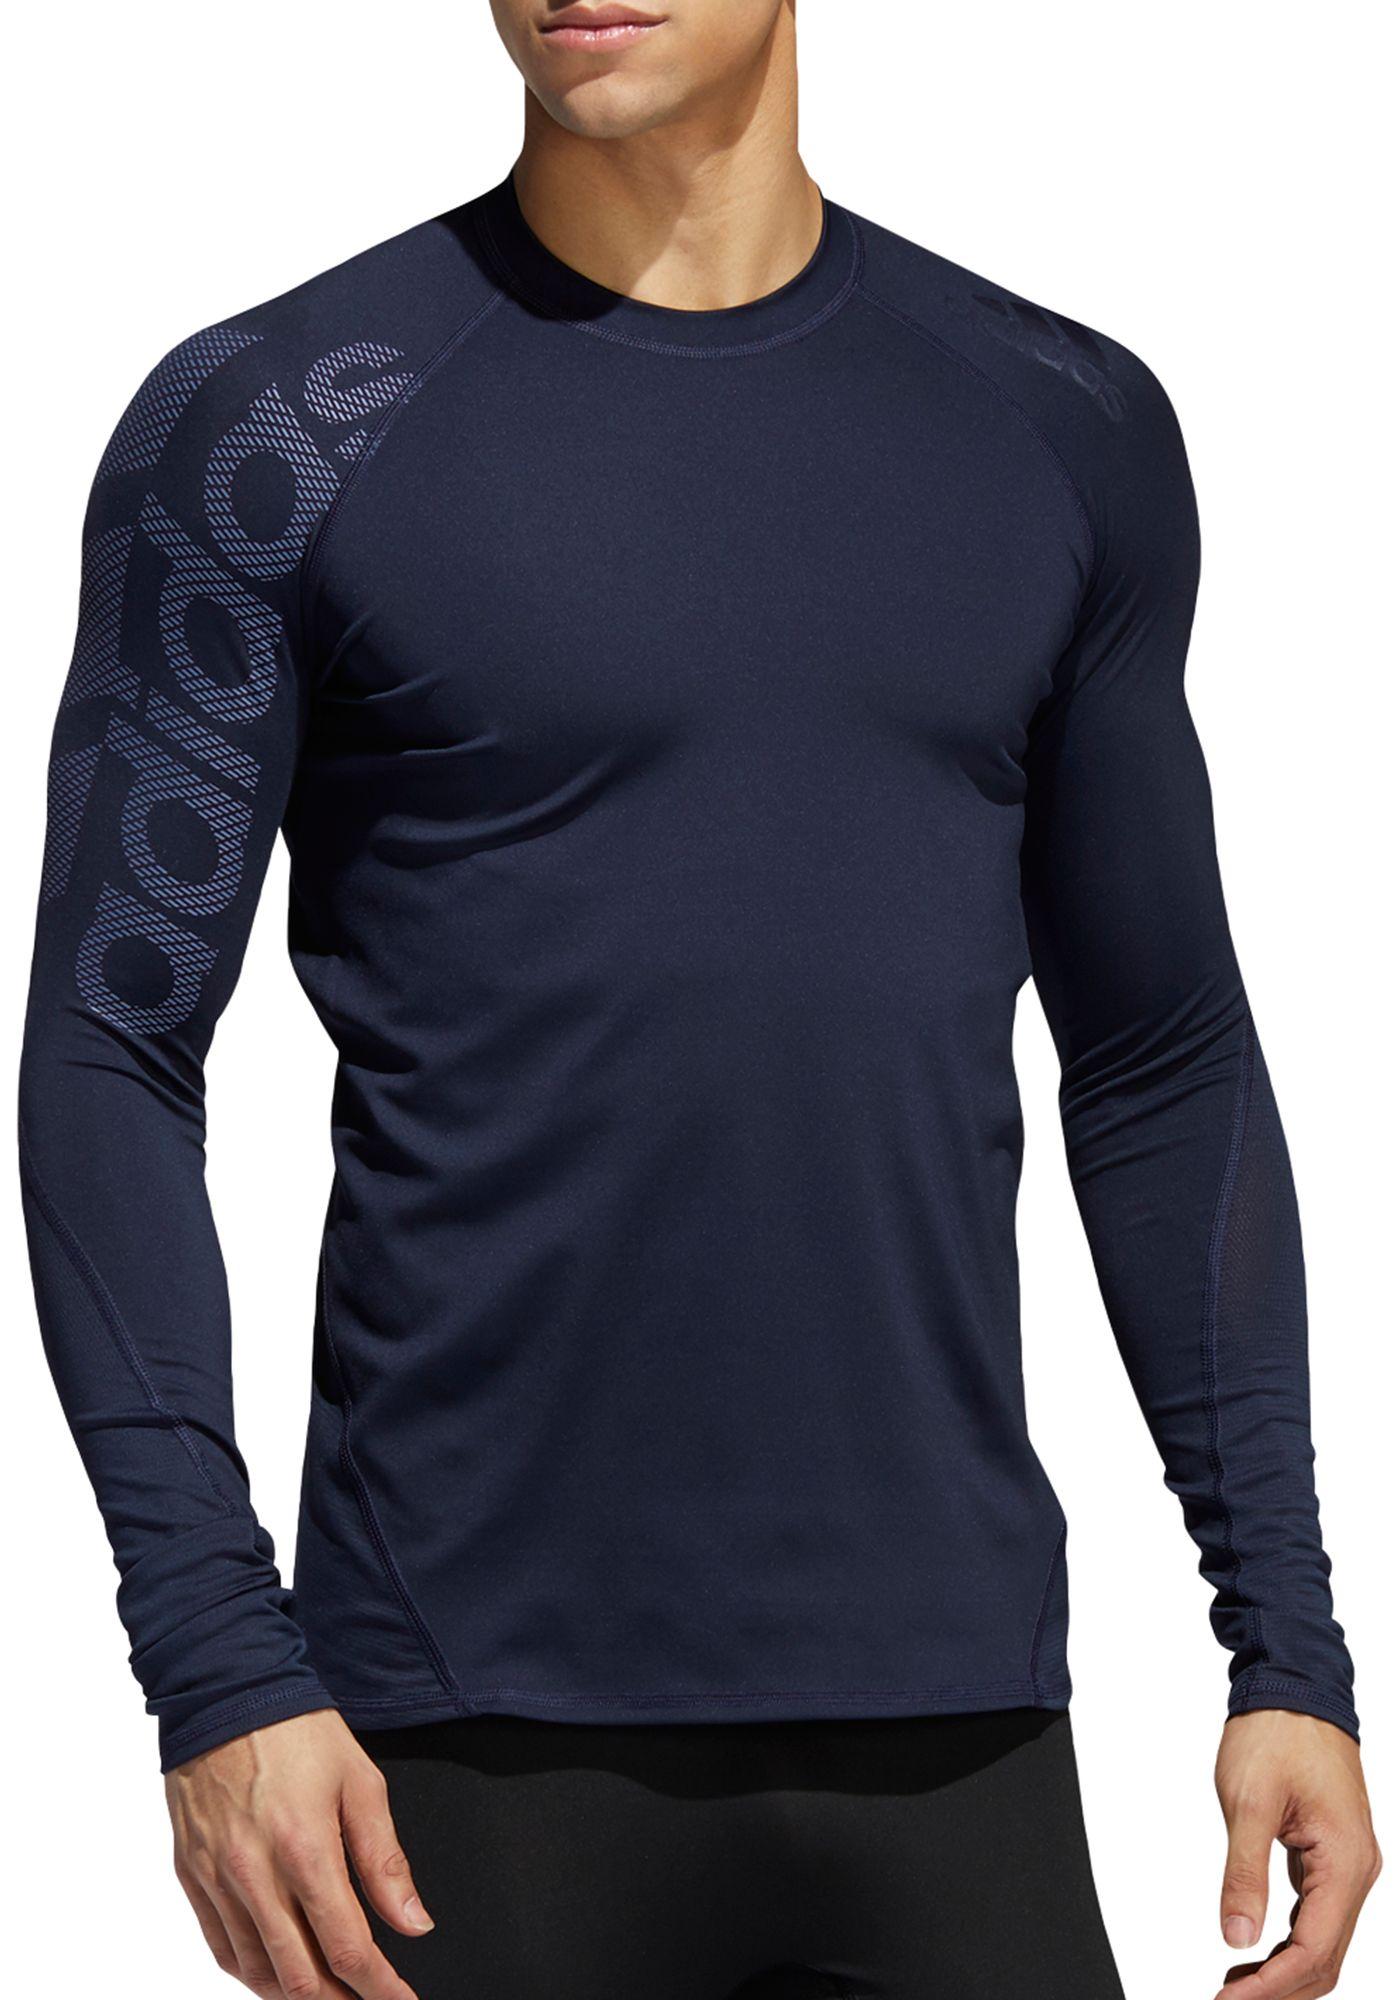 adidas Men's Alphaskin Badge of Sport Logo Compression Long Sleeve Shirt